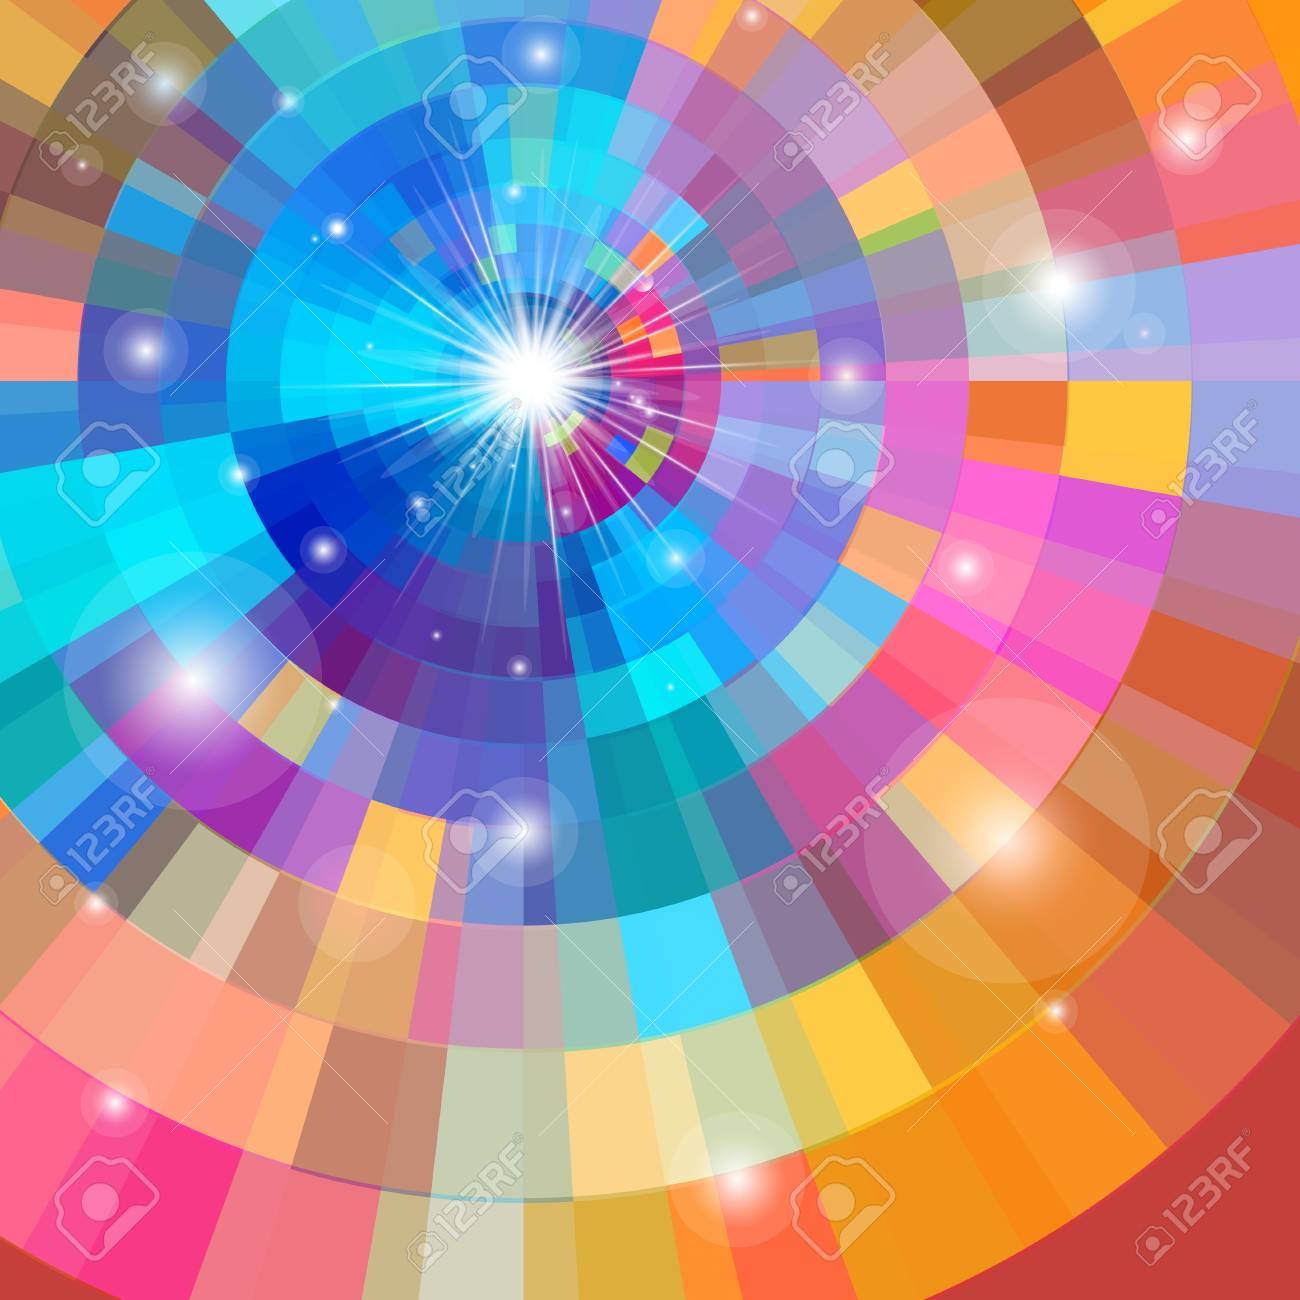 Bright multicolored gradient background - 85467724